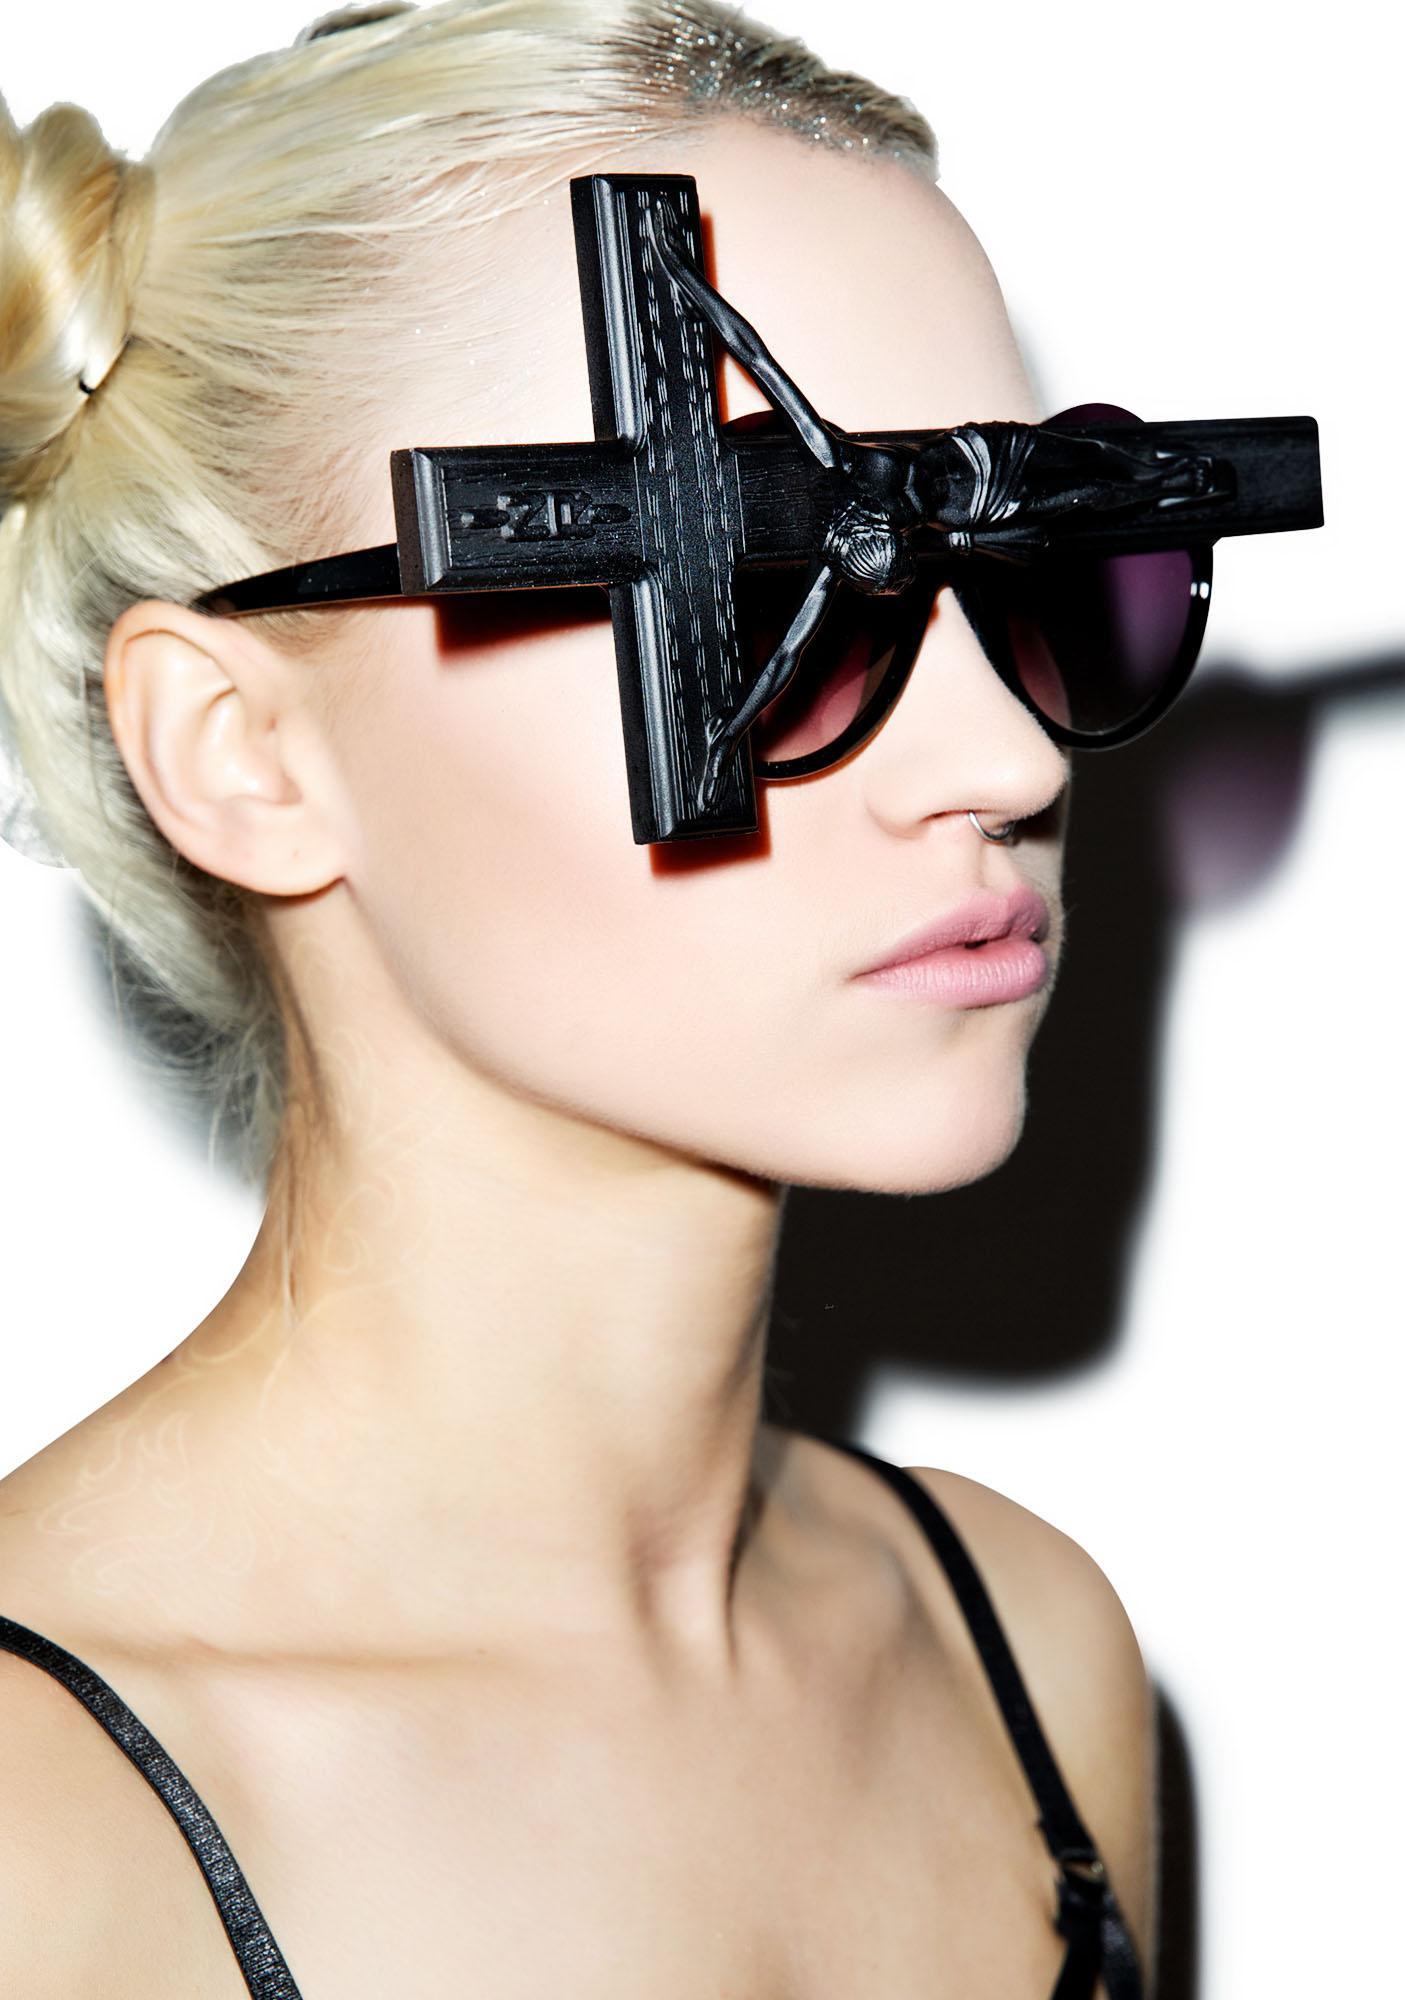 Gasoline Glamour Jesus Throwing Shade Sunglasses